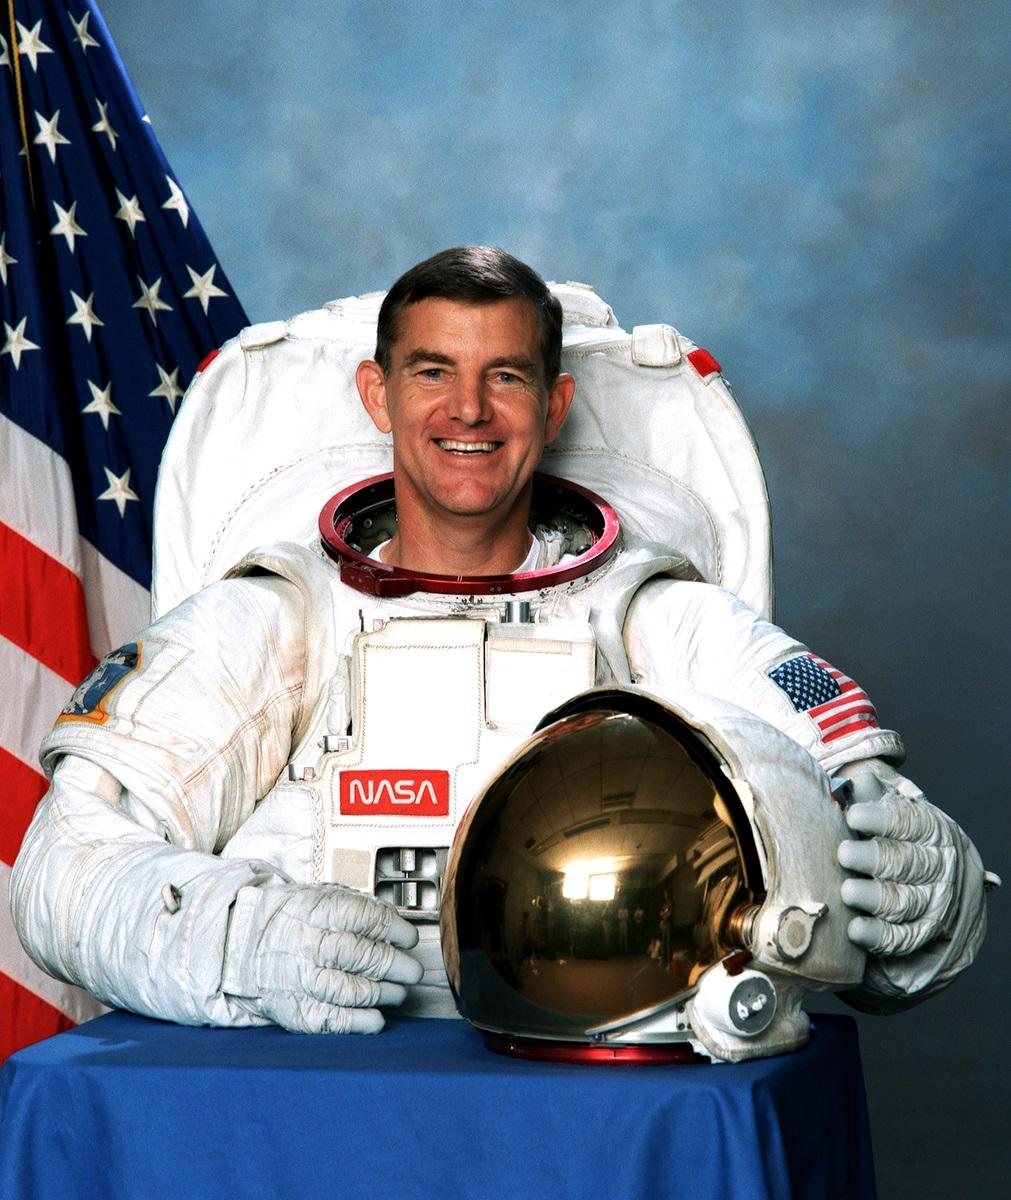 longest serving astronaut in space - photo #24